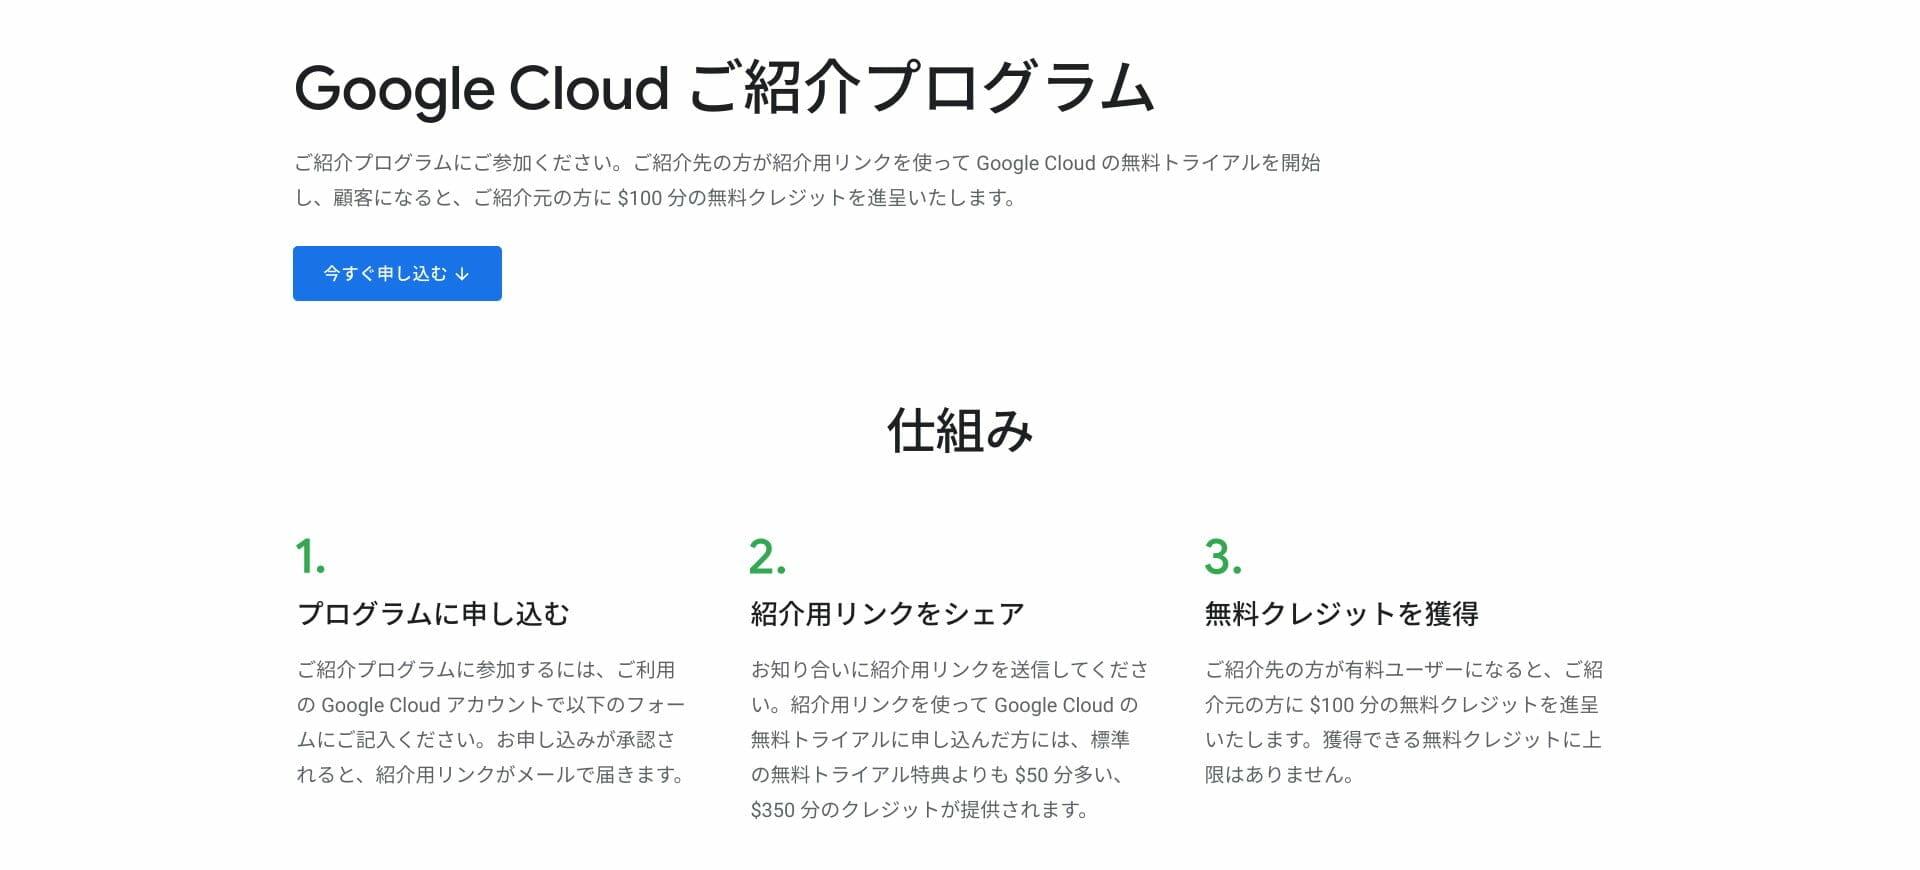 Google Cloud ご紹介プログラム